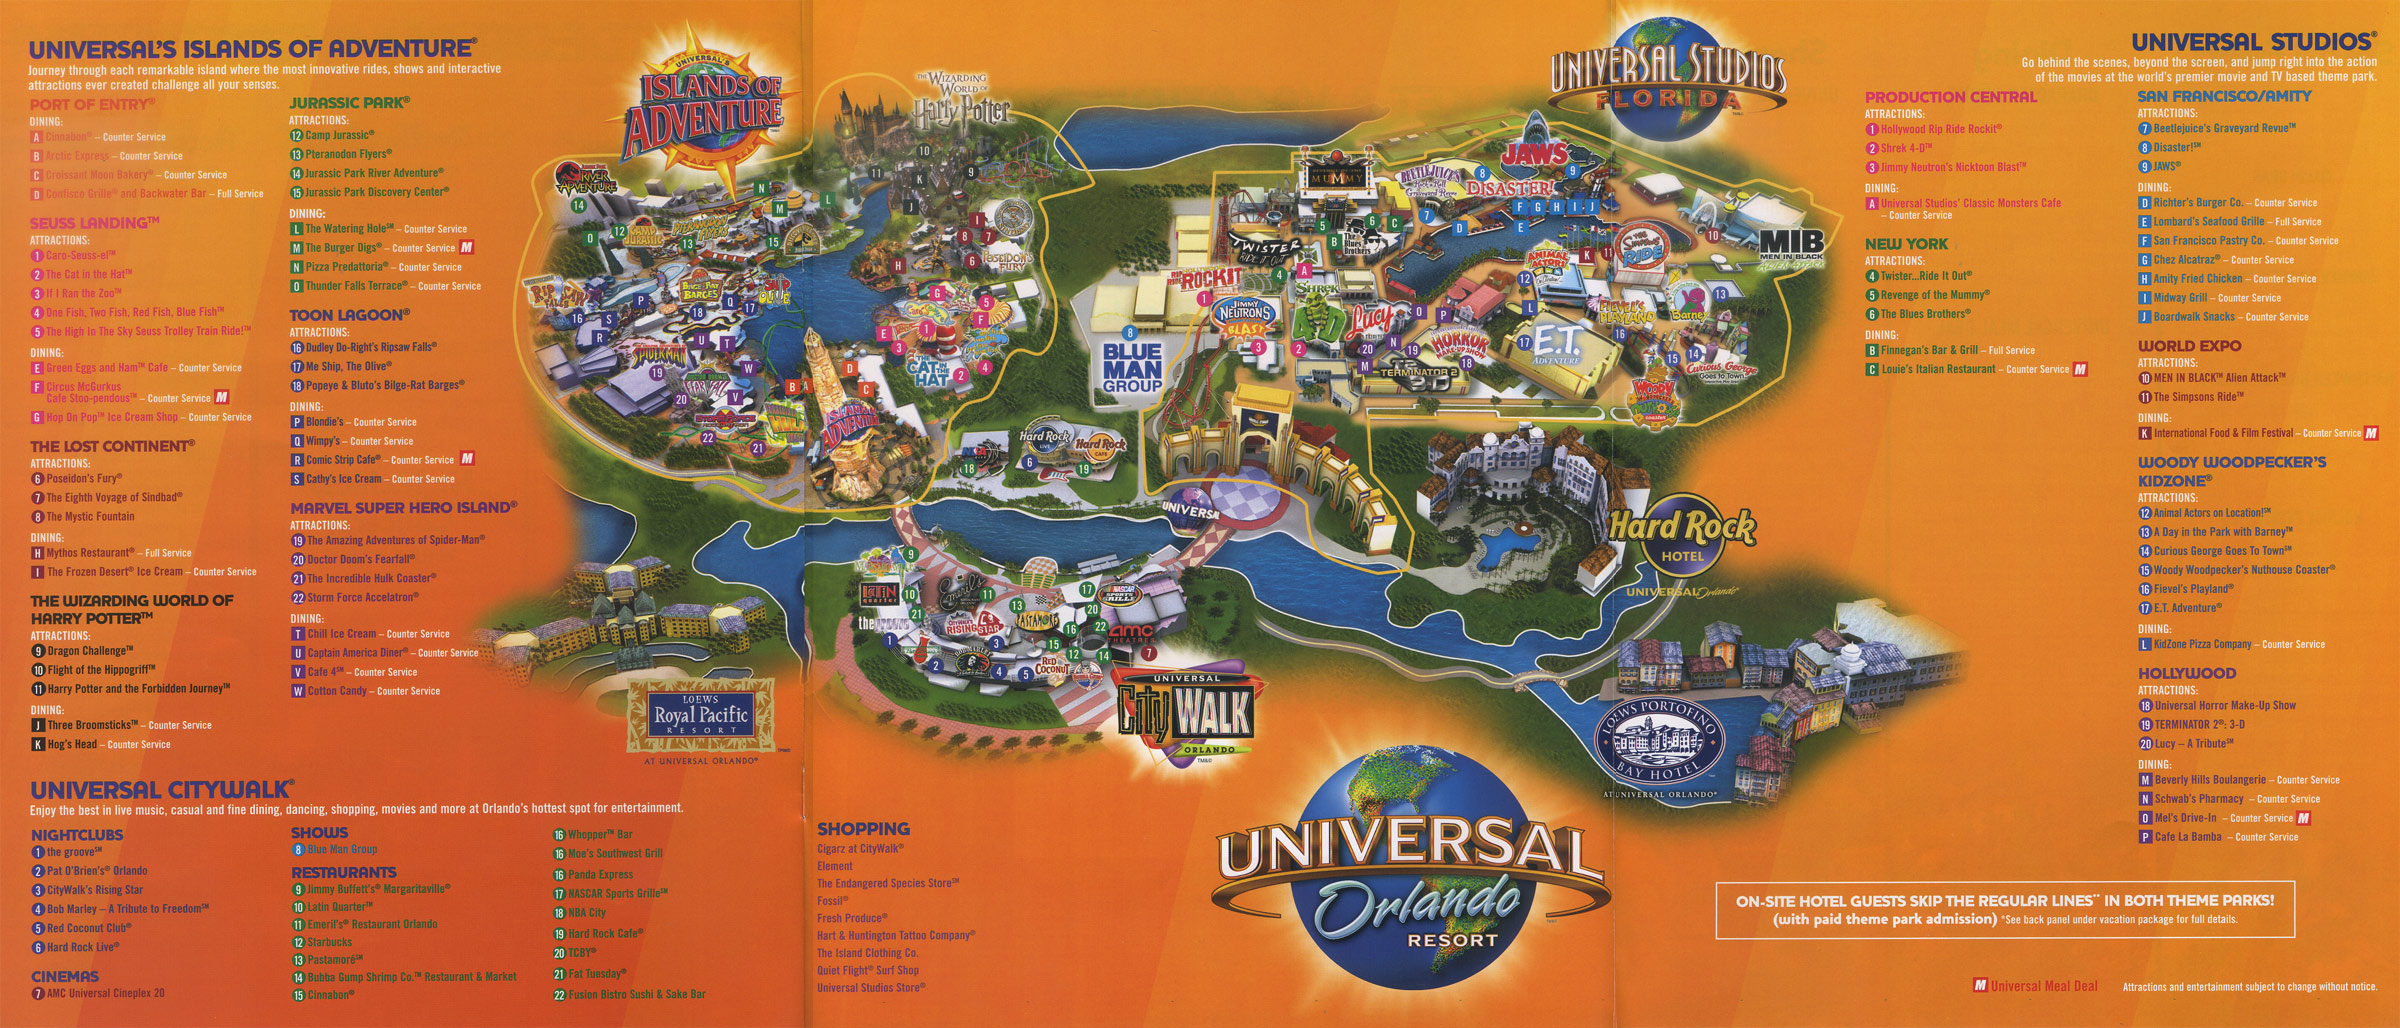 Theme Park Brochures Universal Orlando Resort - Theme Park Brochures - Map Of Universal Studios Florida Hotels